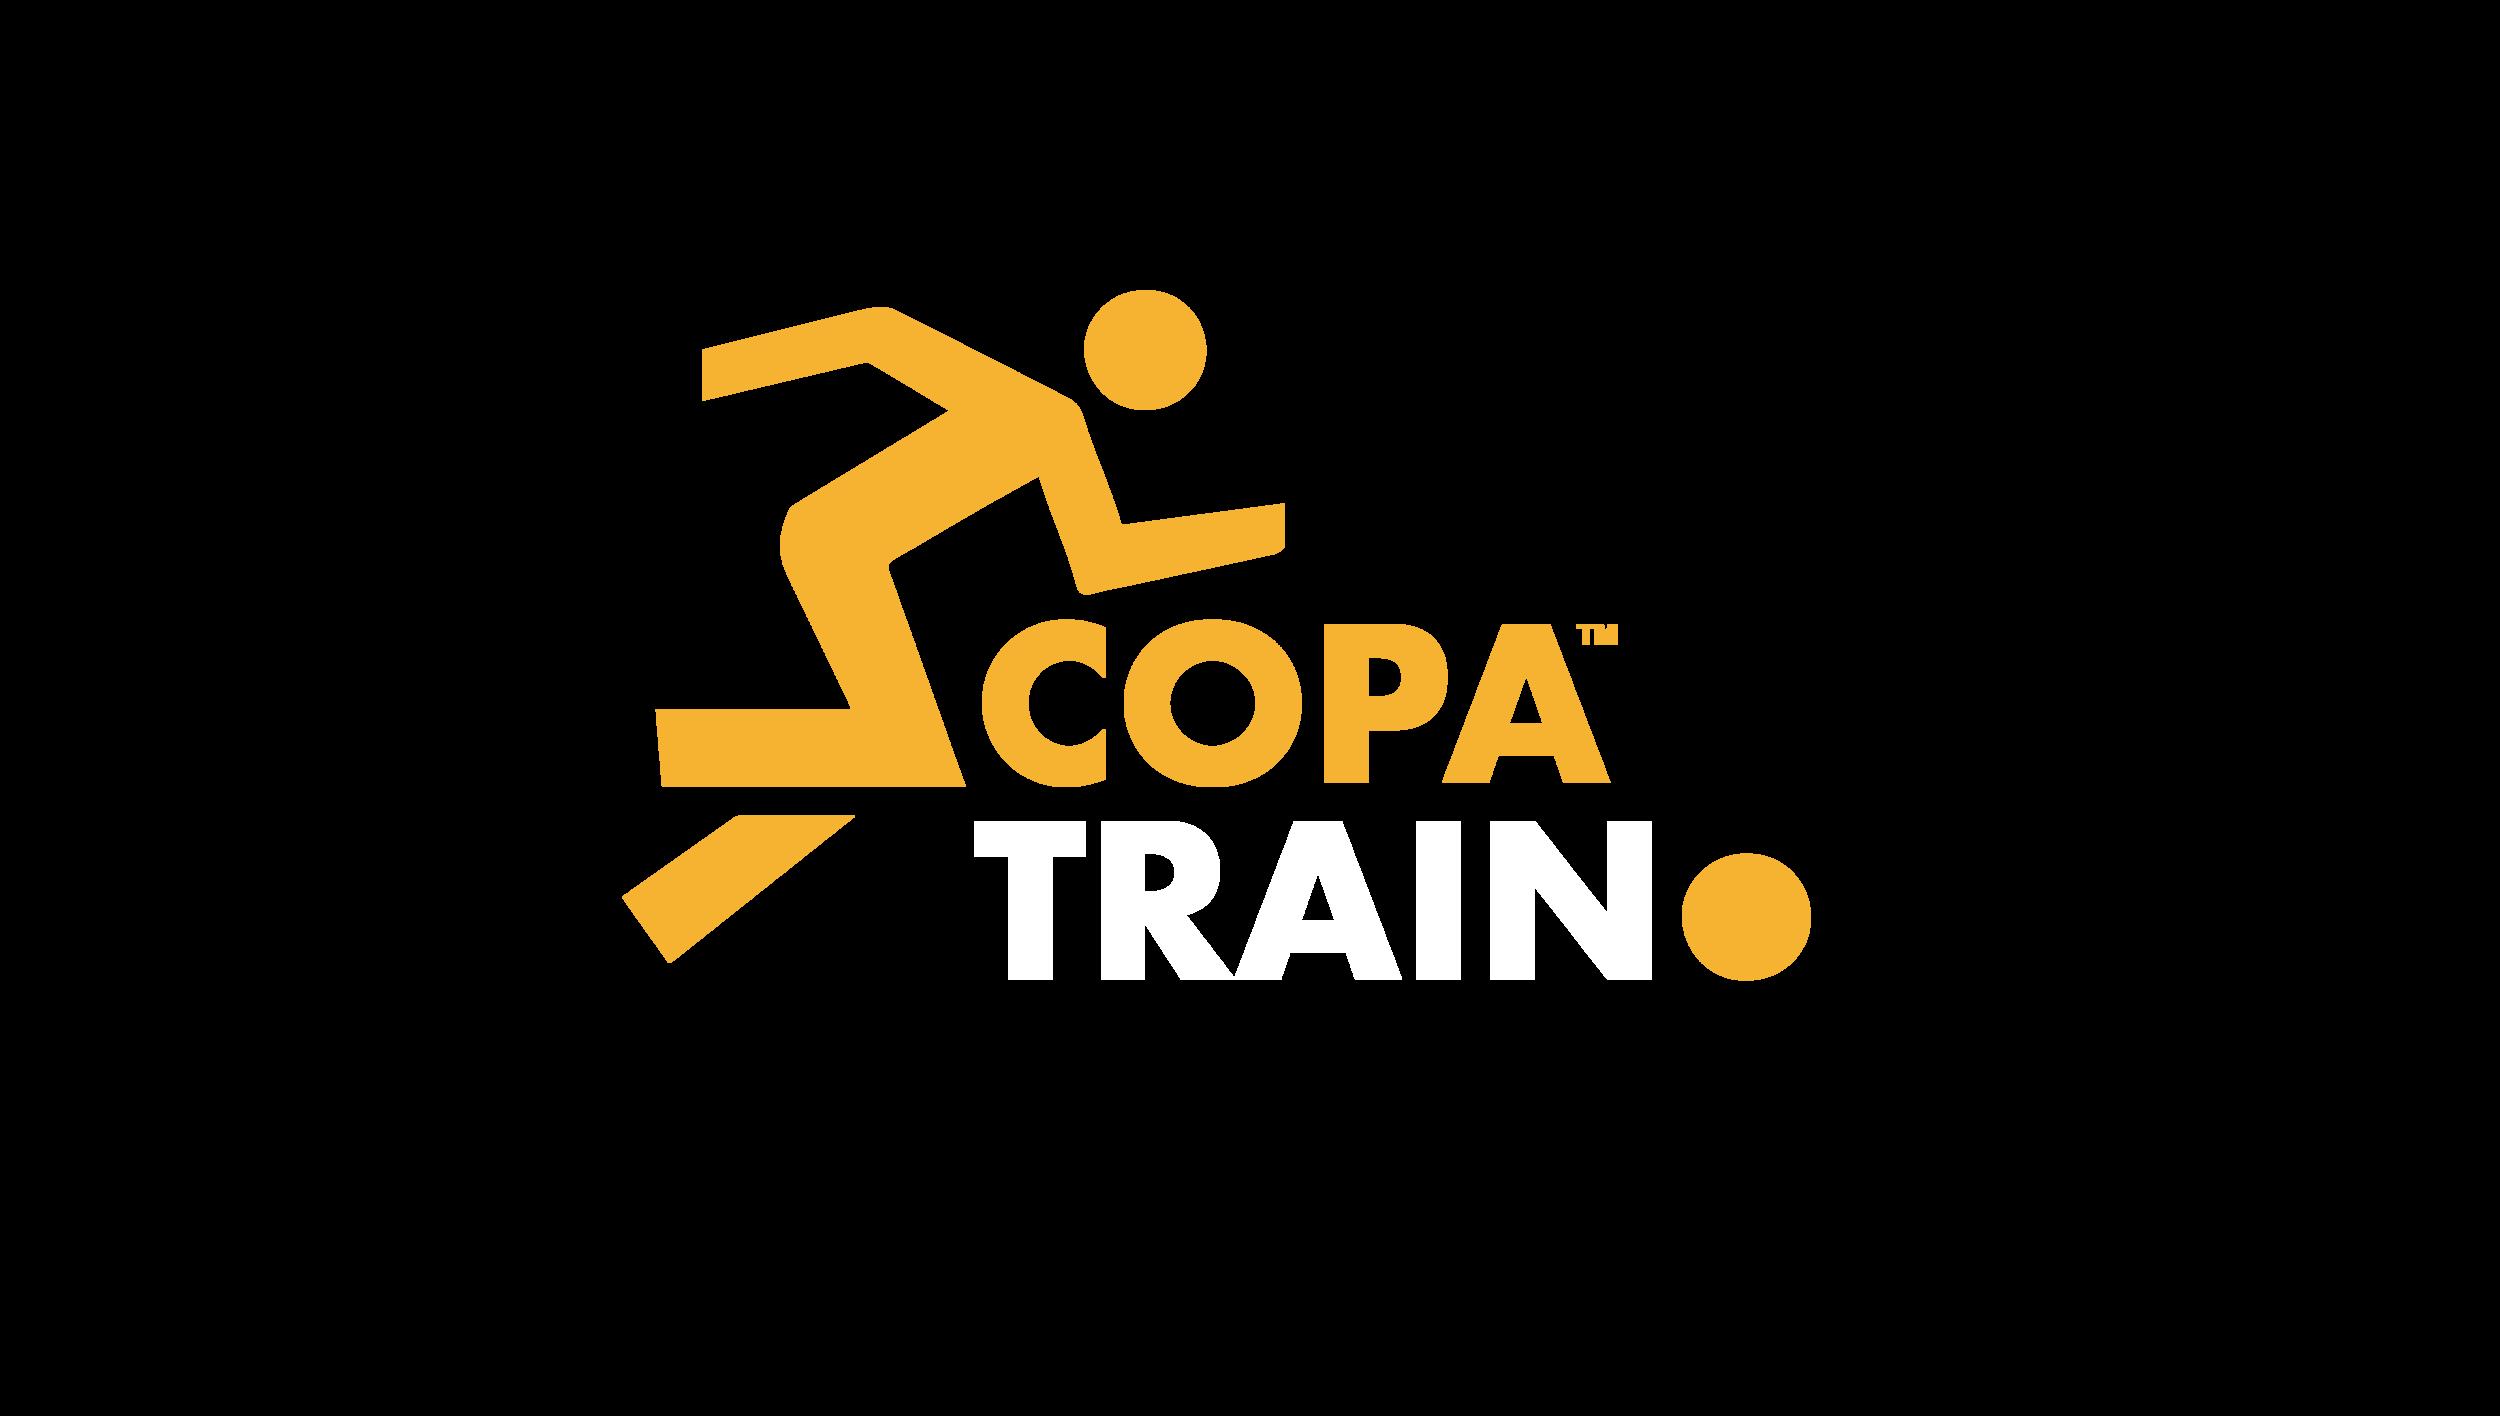 COPA TRAIN option one logo-14b_white.png